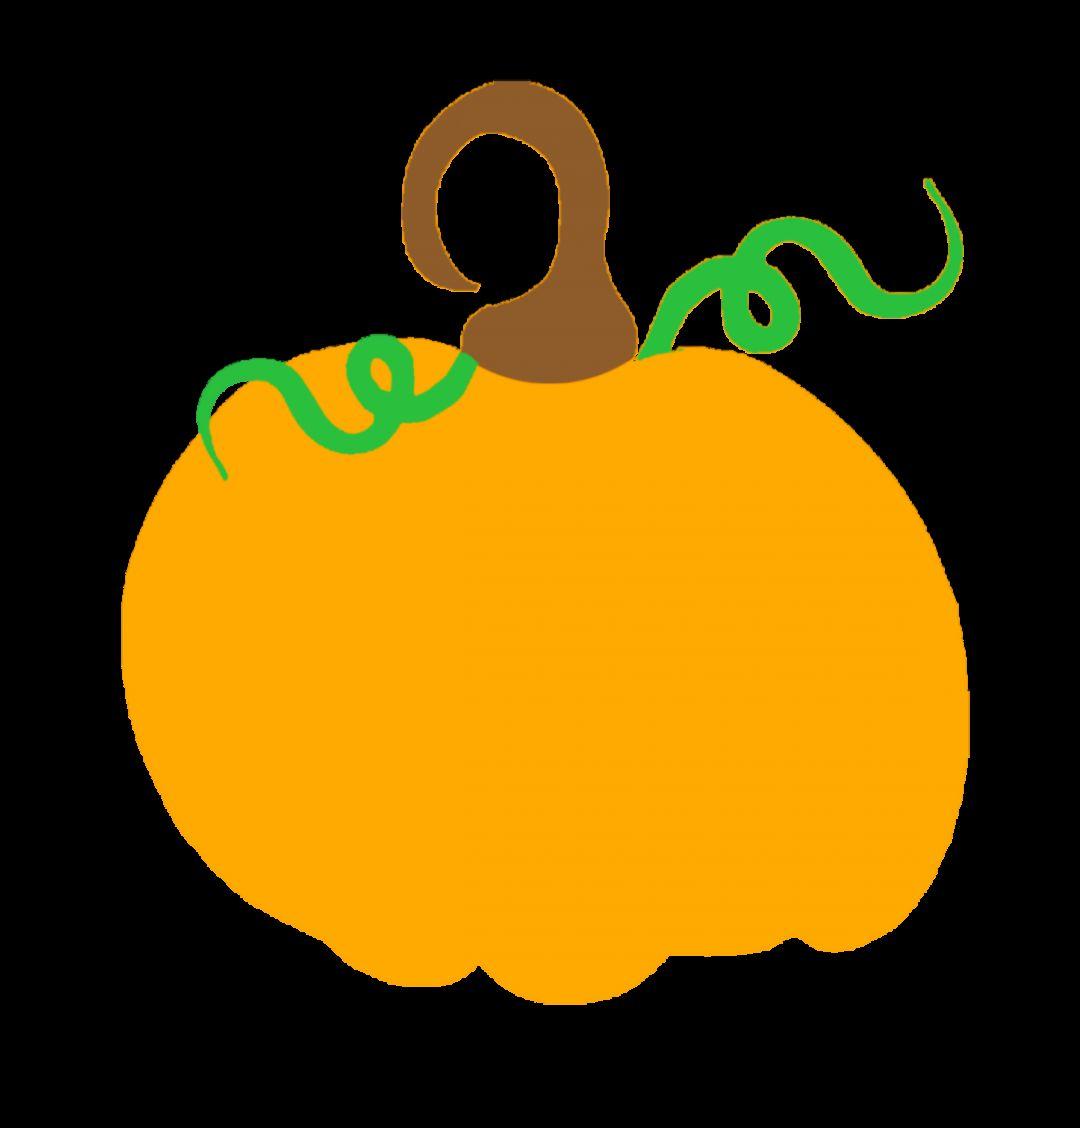 Pumpkin Clipart to Download